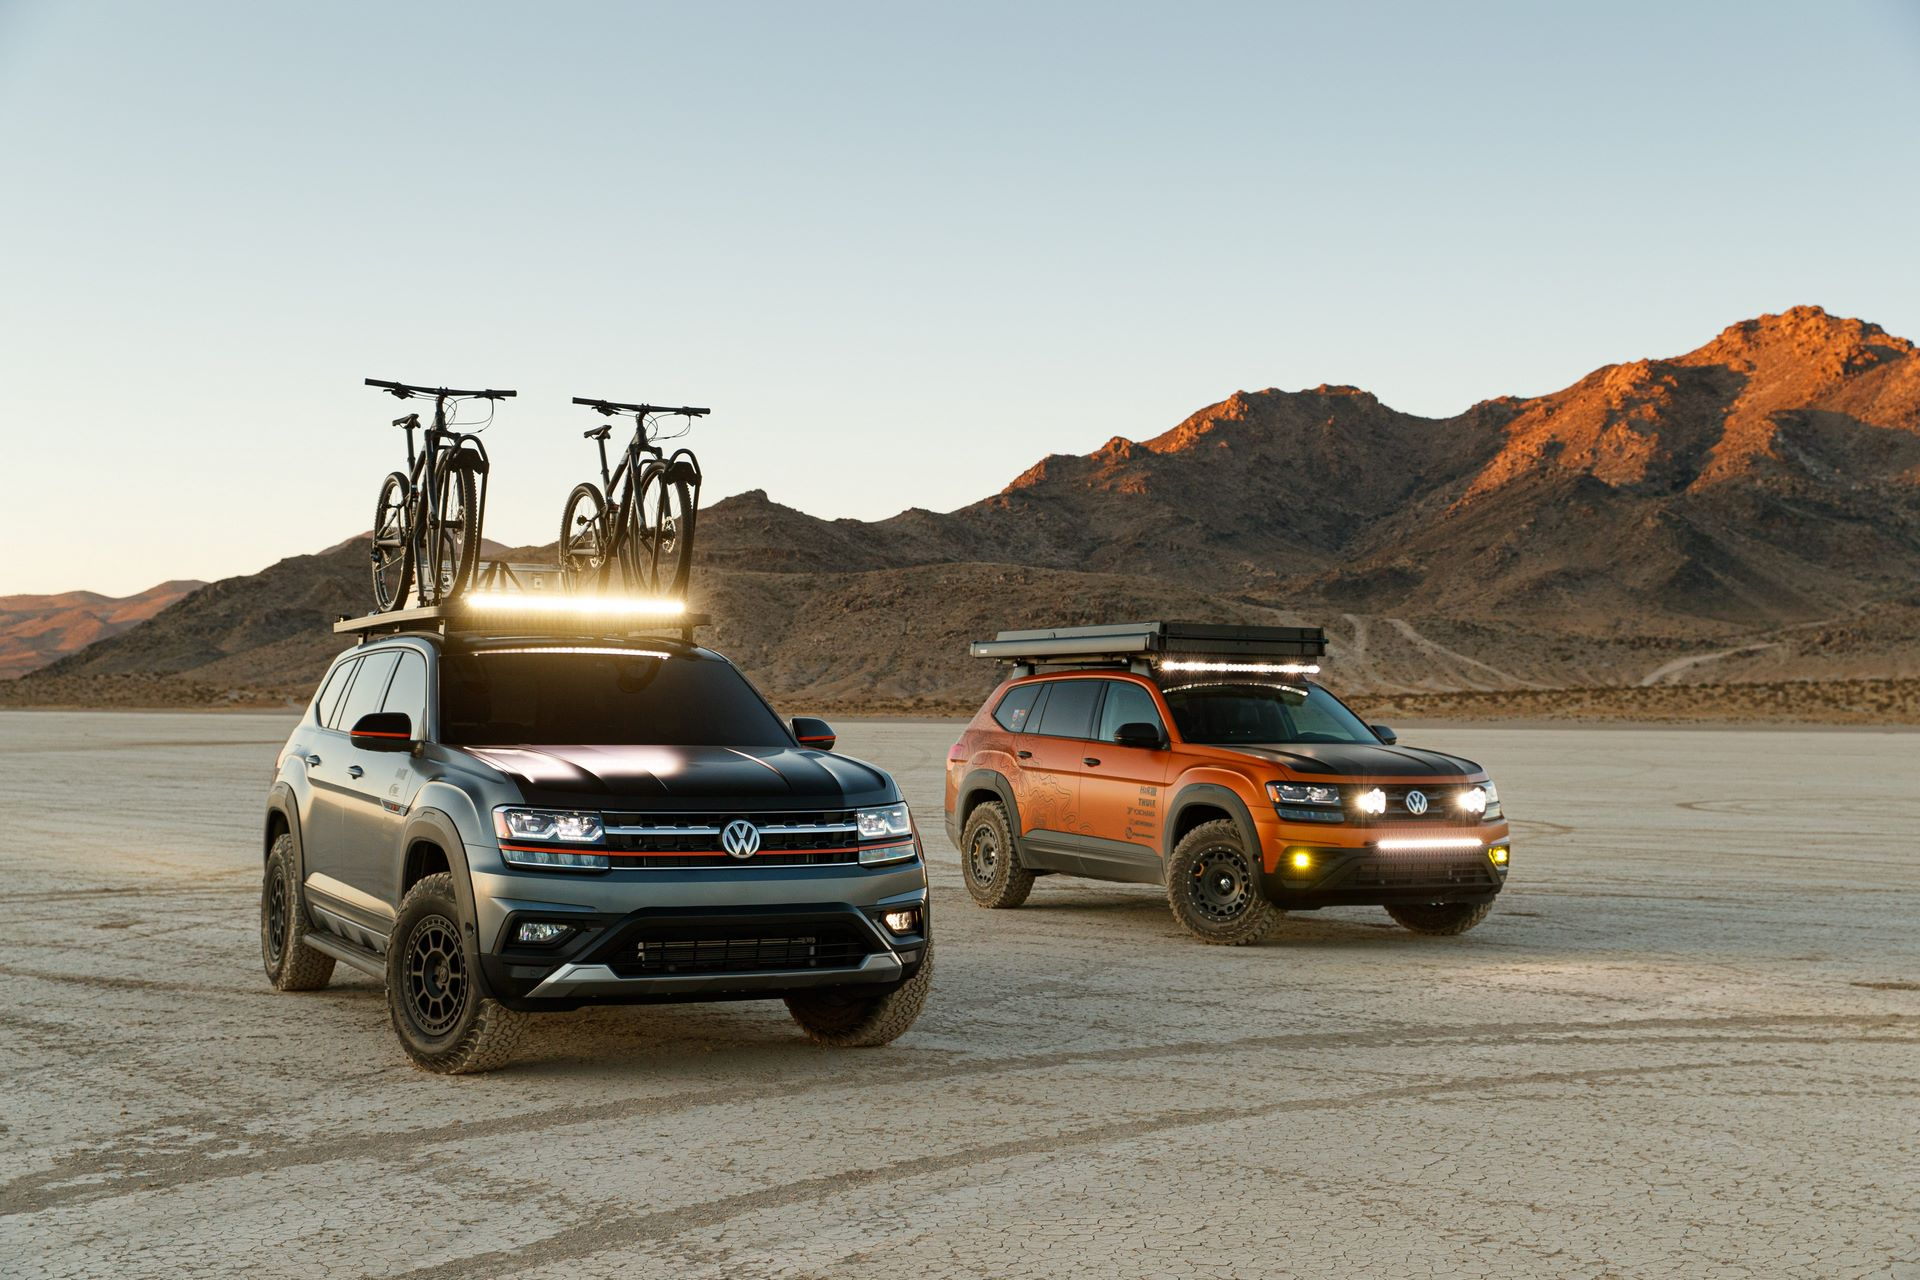 Volkswagen_Atlas_Adventure_Concept_and_Atlas_Basecamp_Concept-10448